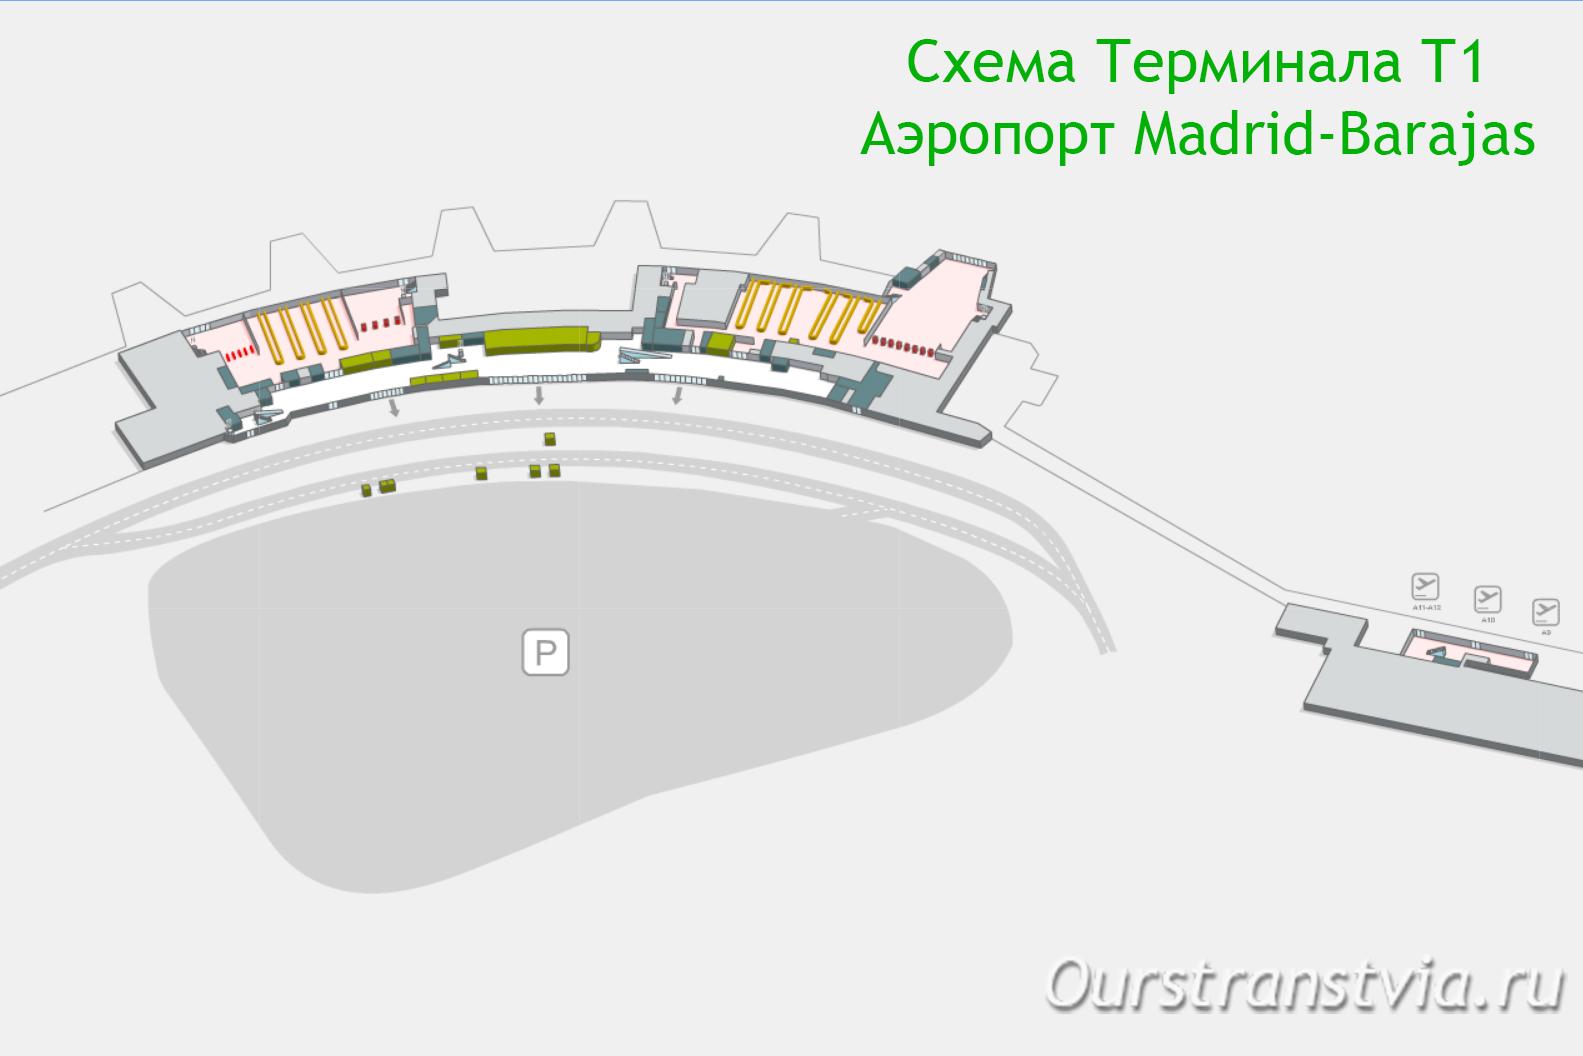 Схема Терминала T1, Аэропорт Барахас